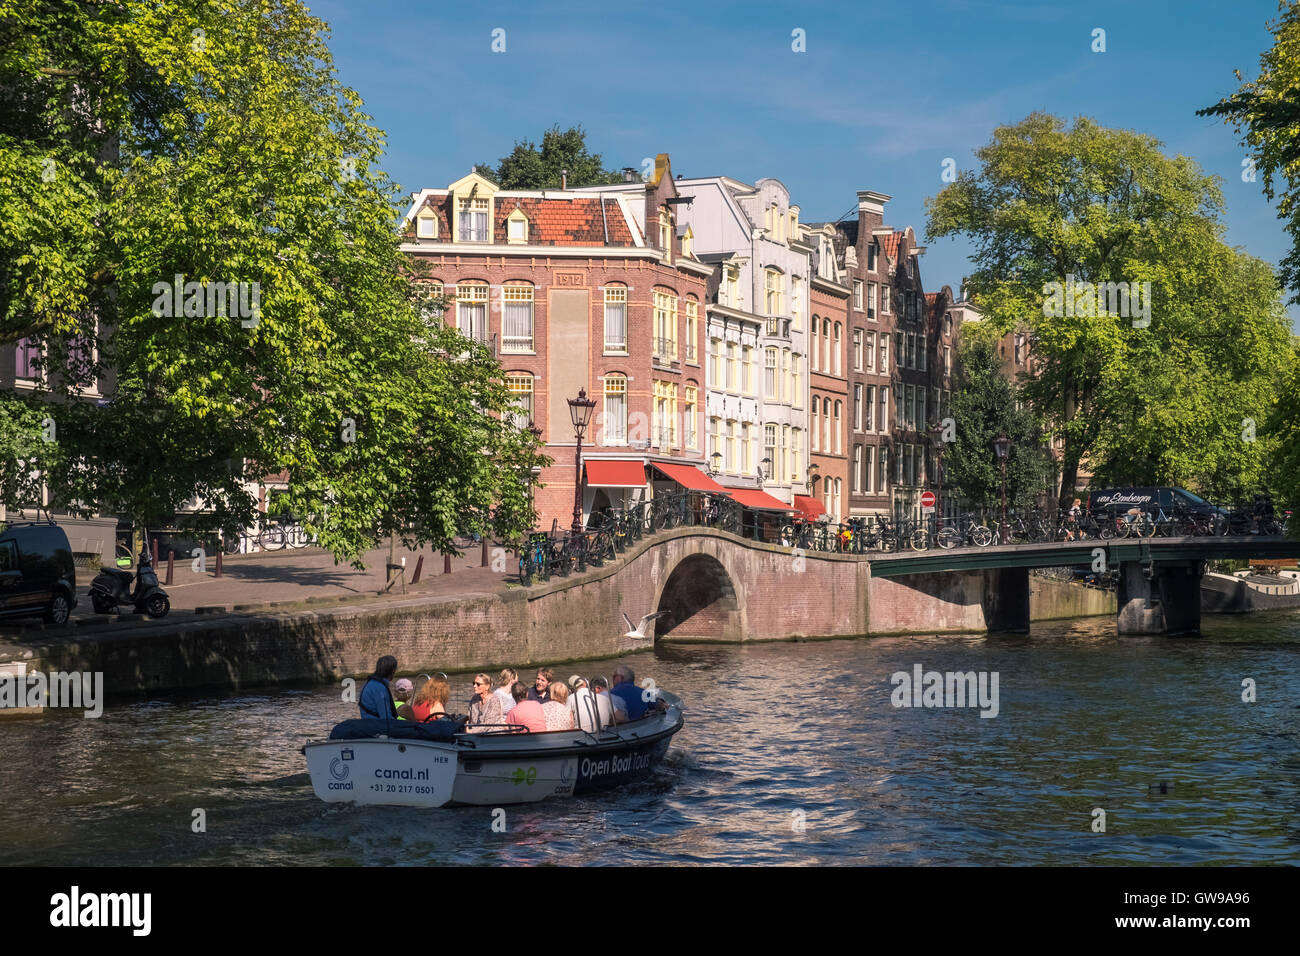 Prinsengracht canal, Amsterdam, Netherlands. - Stock Image